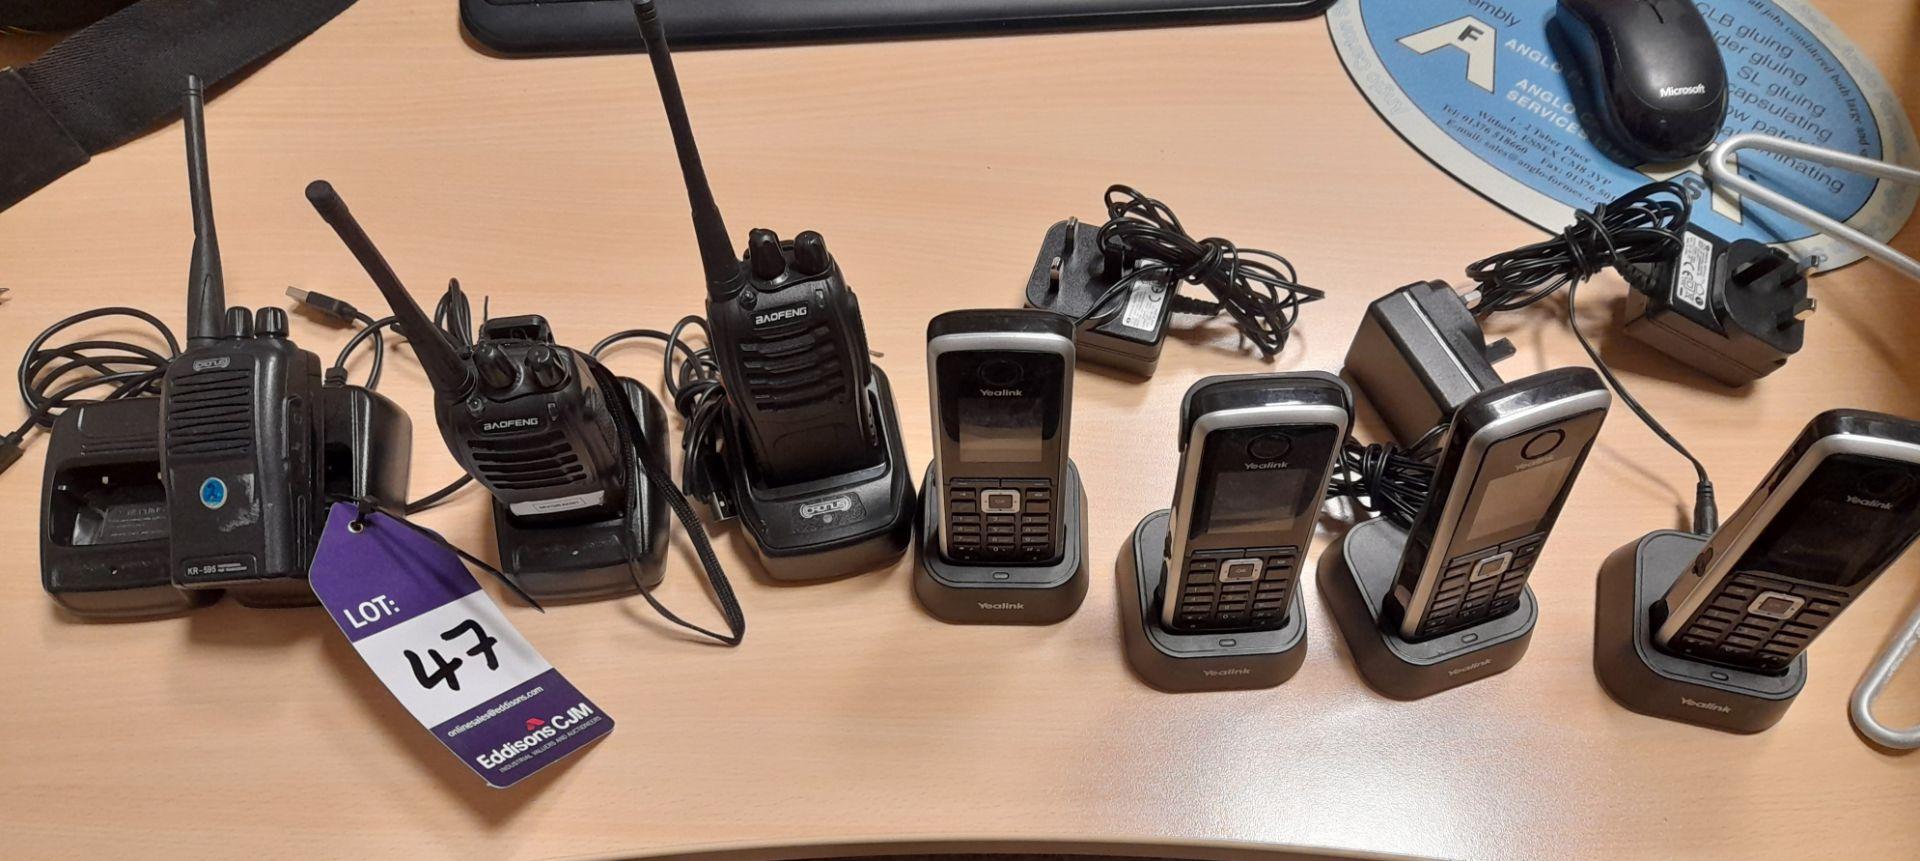 4 x Yealink cordless telephone sets, Model W52PIP